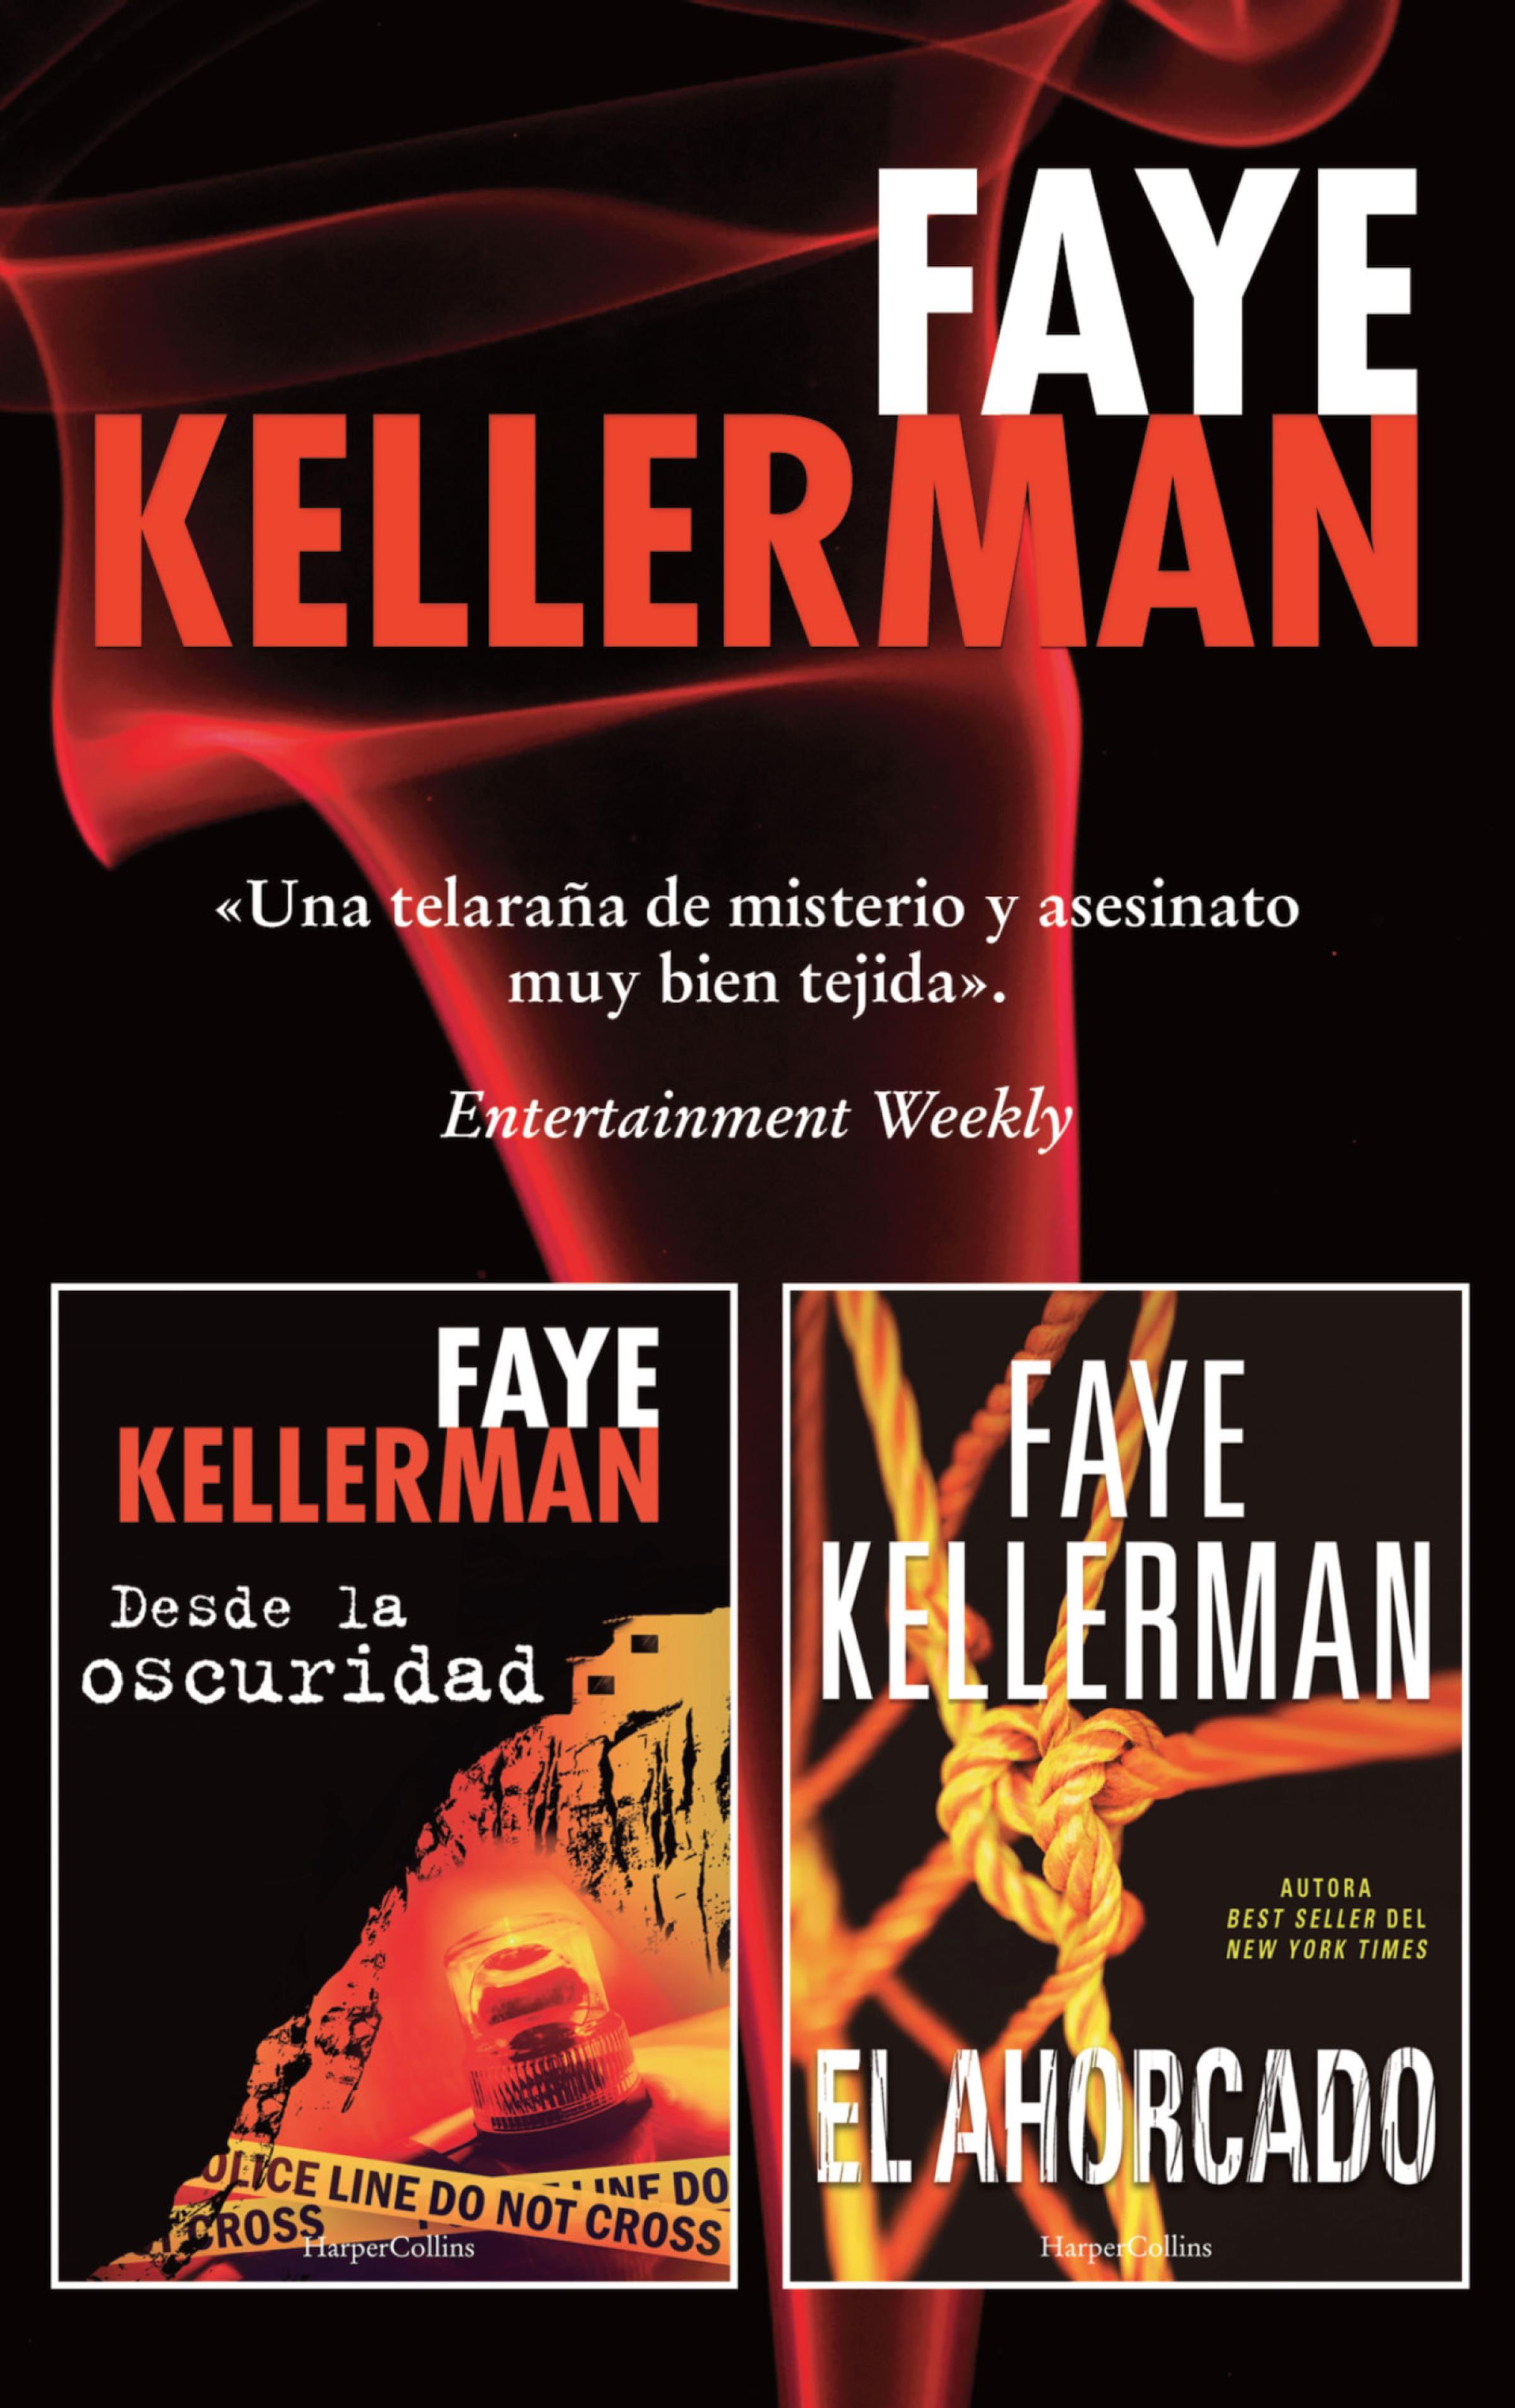 Pack Faye Keyerman - Febrero 2018 ( Faye  Kellerman  )